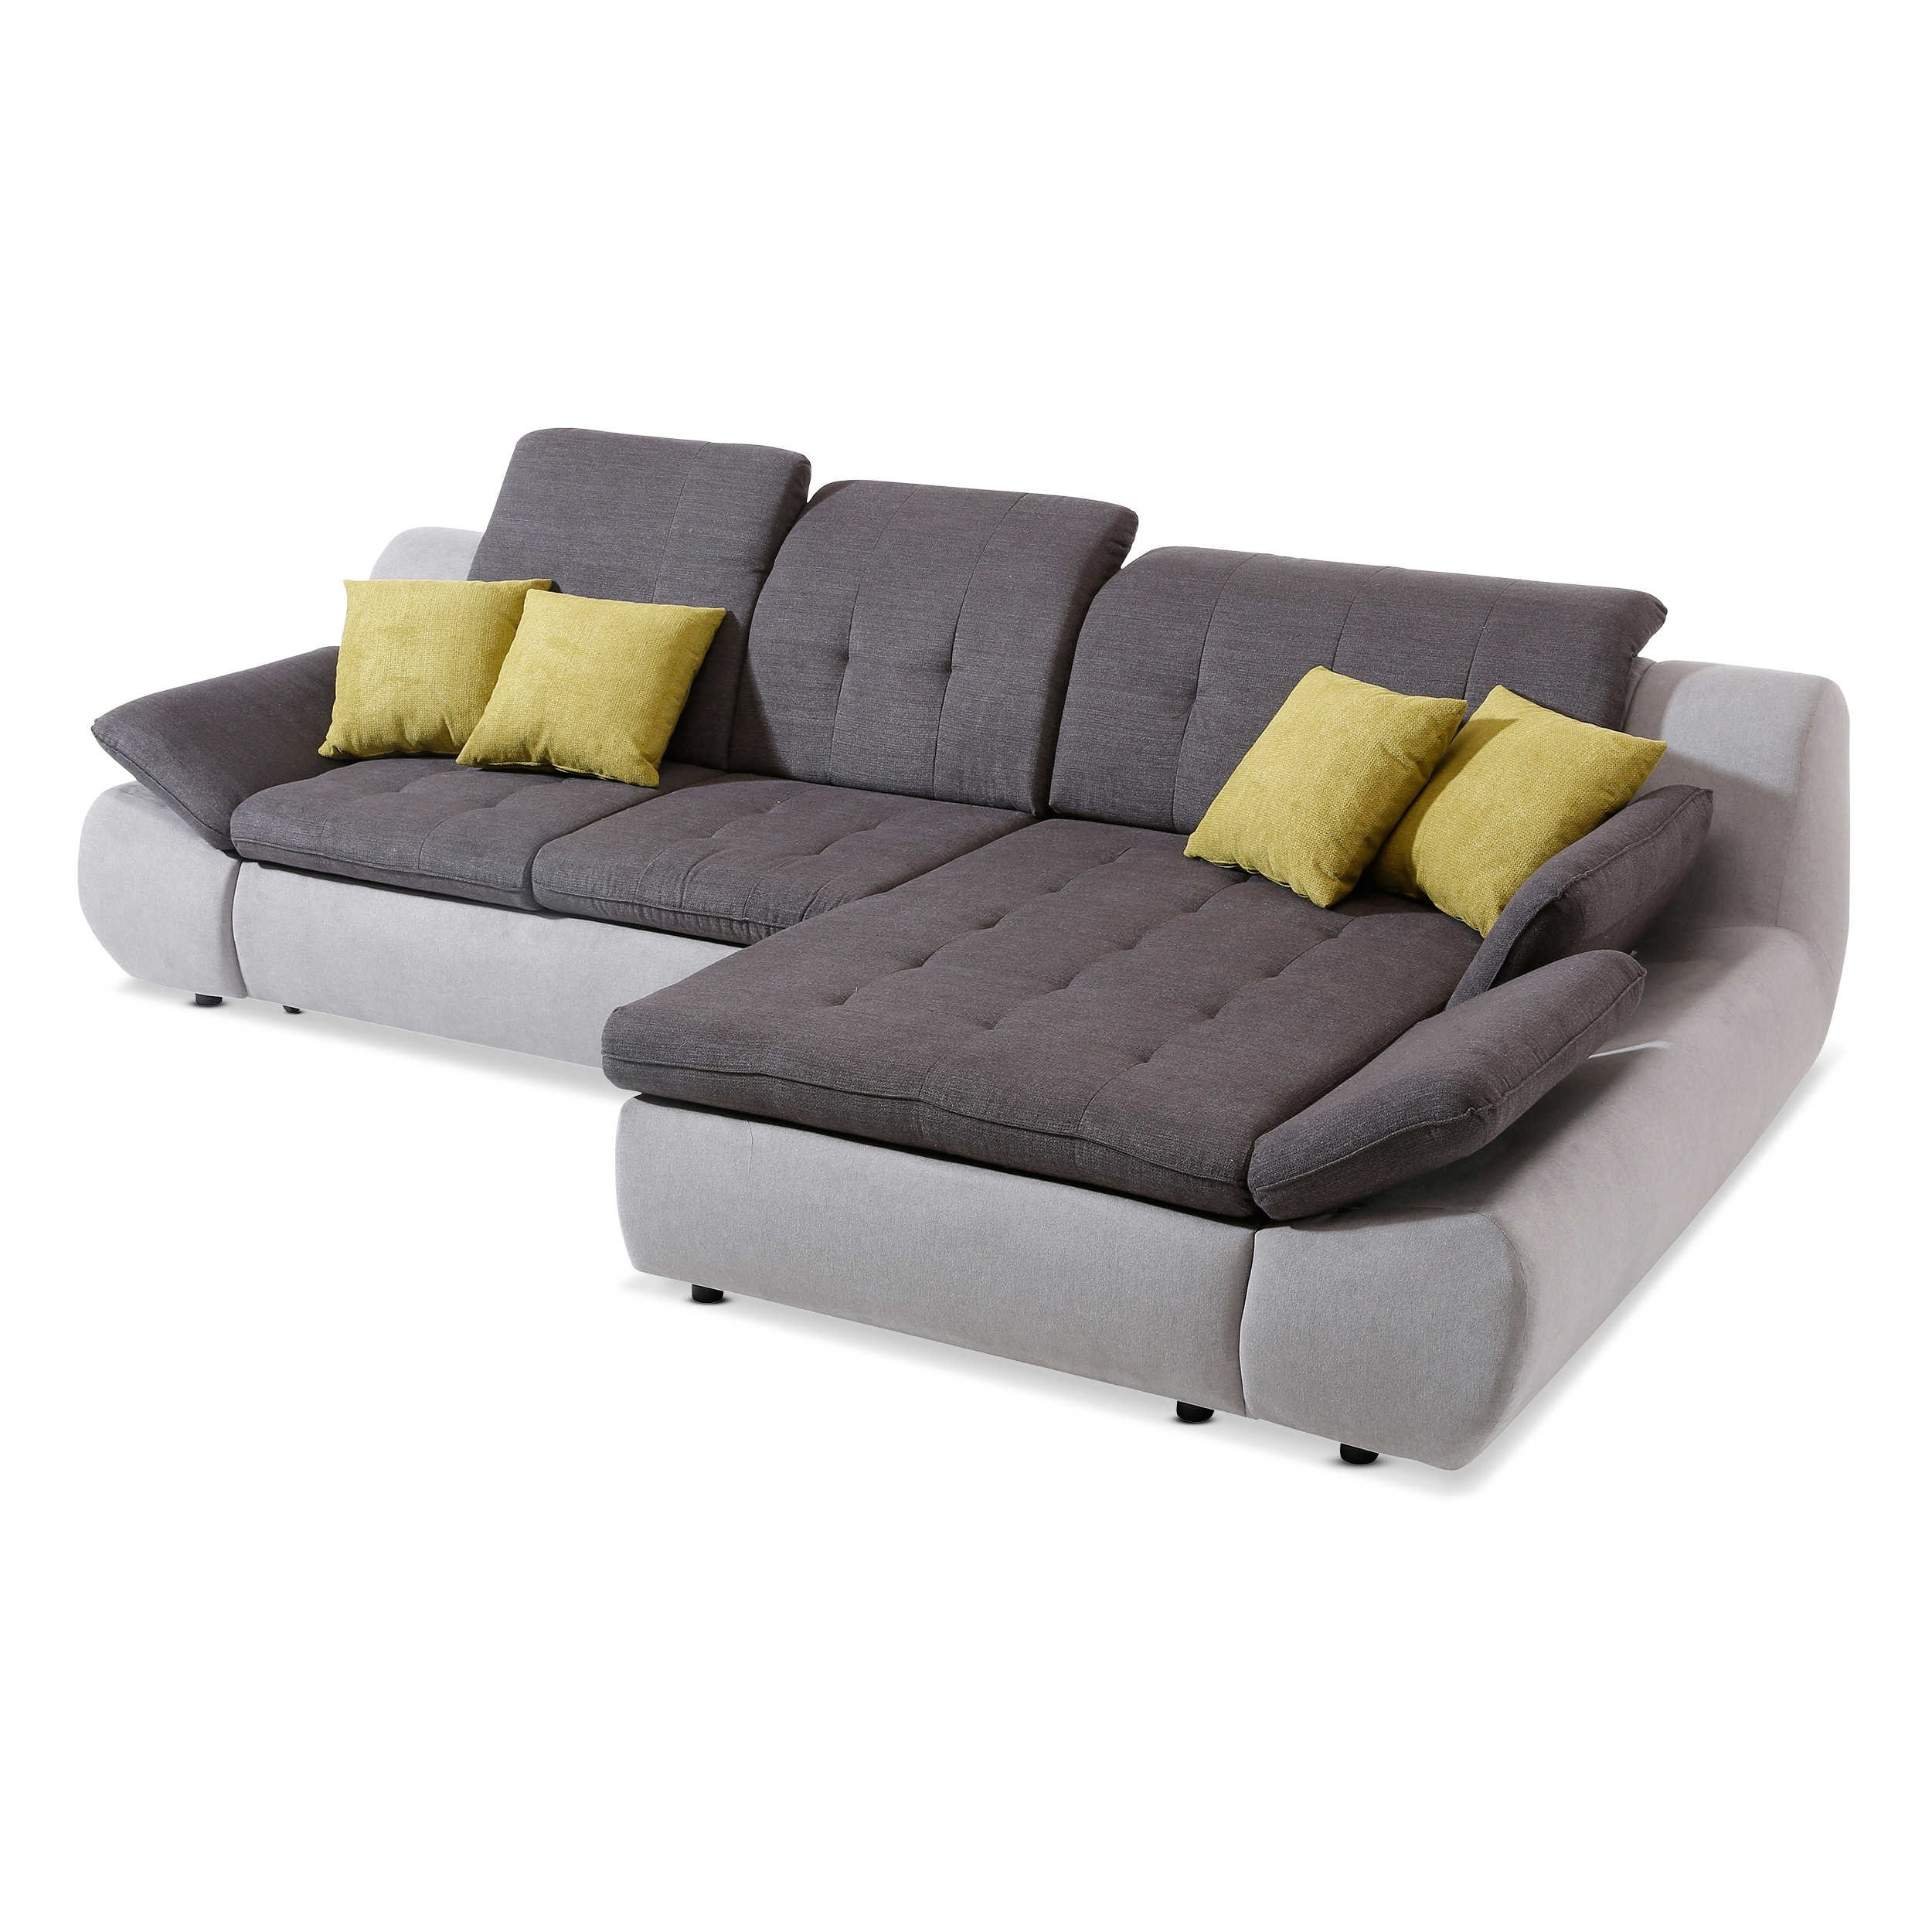 ecksofa smile grau stoff online kaufen bei woonio. Black Bedroom Furniture Sets. Home Design Ideas